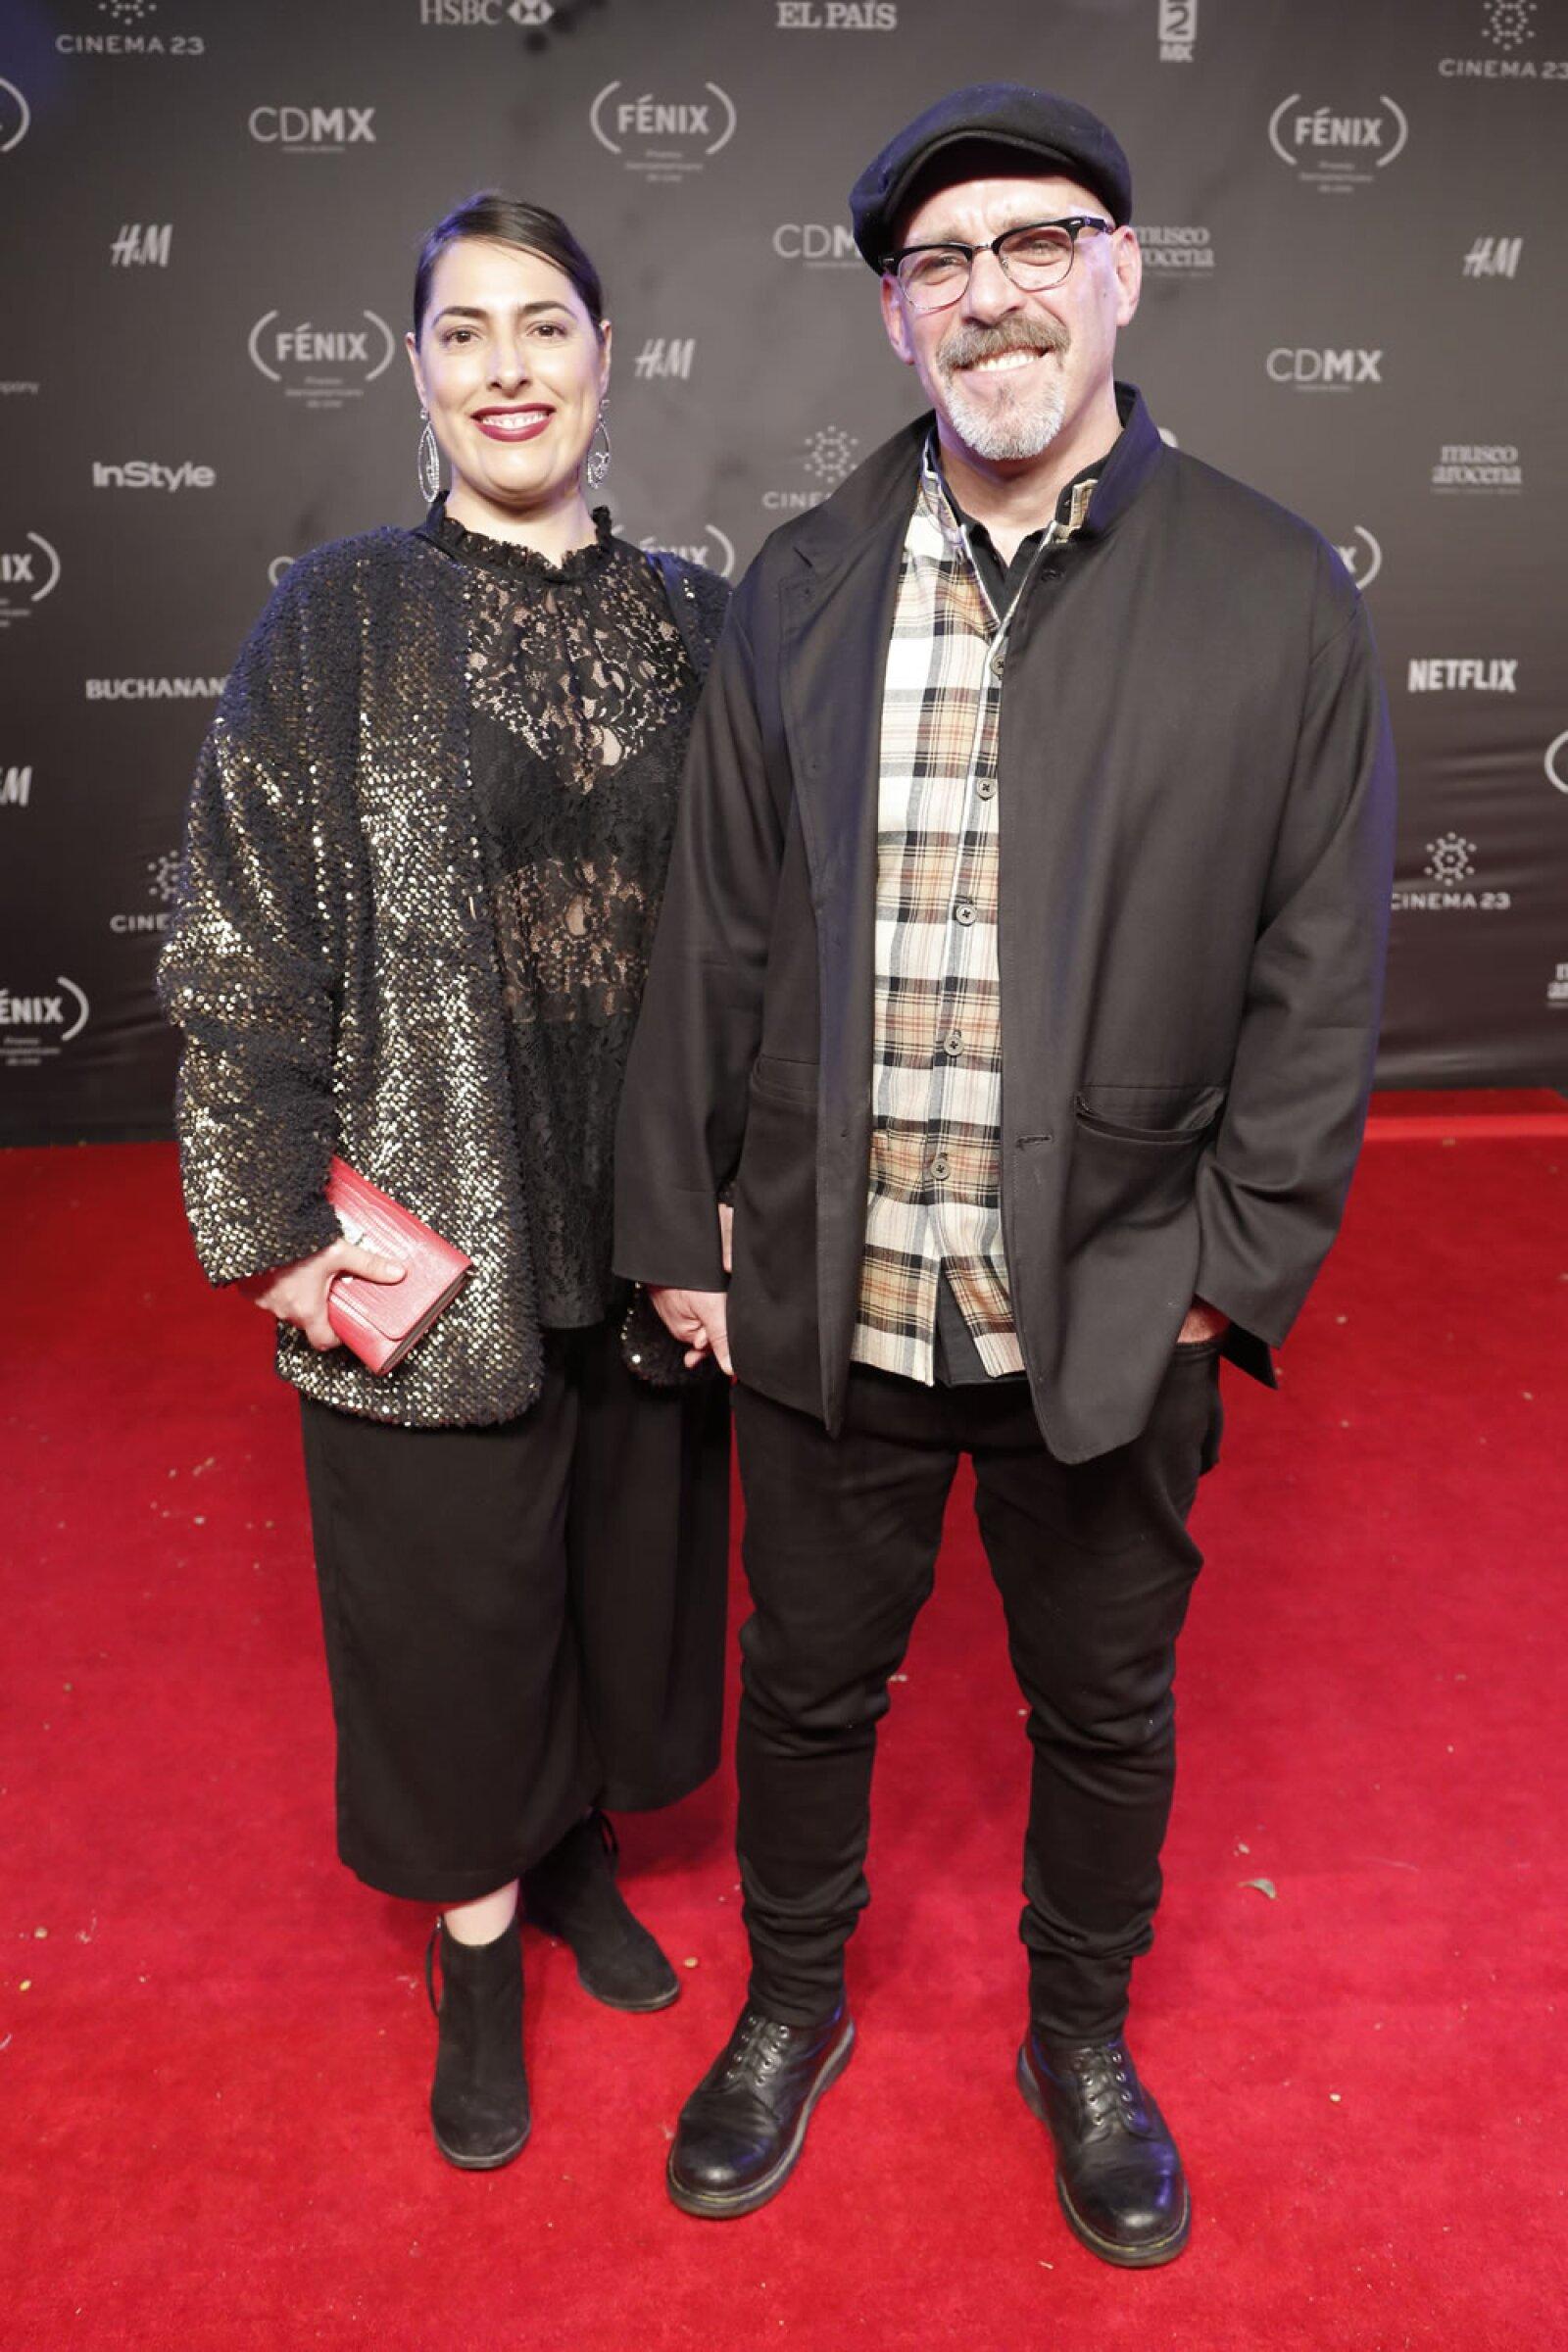 Premios Fénix 2017